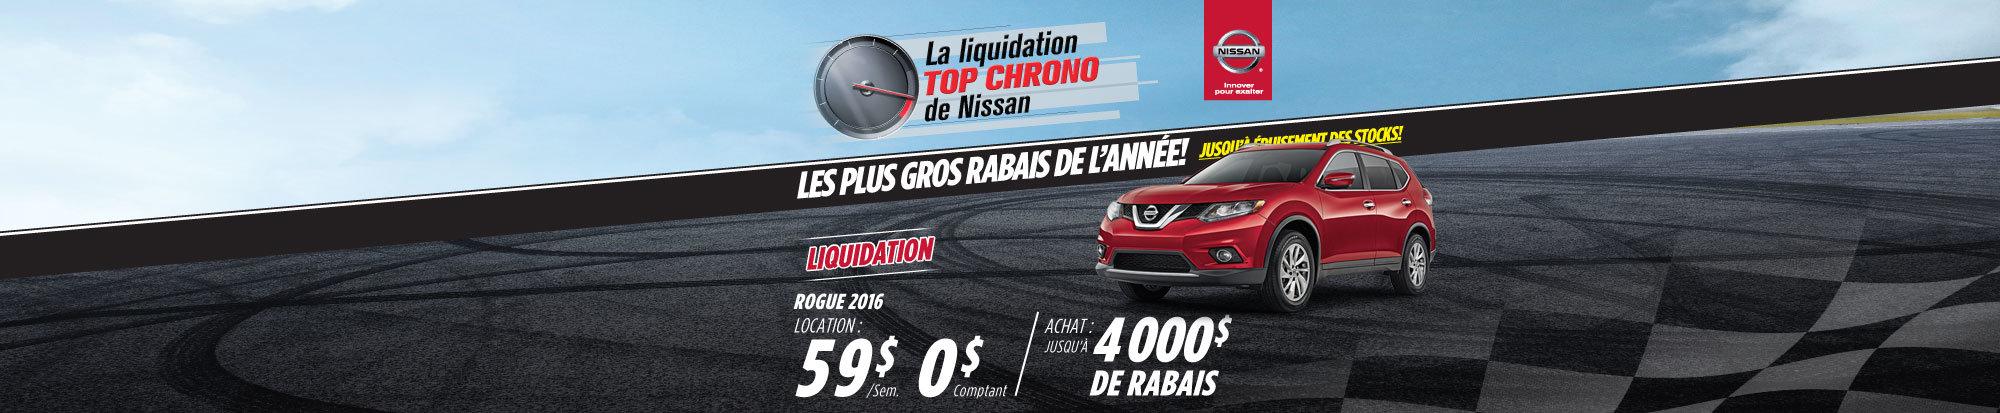 La liquidation top chrono de Nissan - Rogue 2016